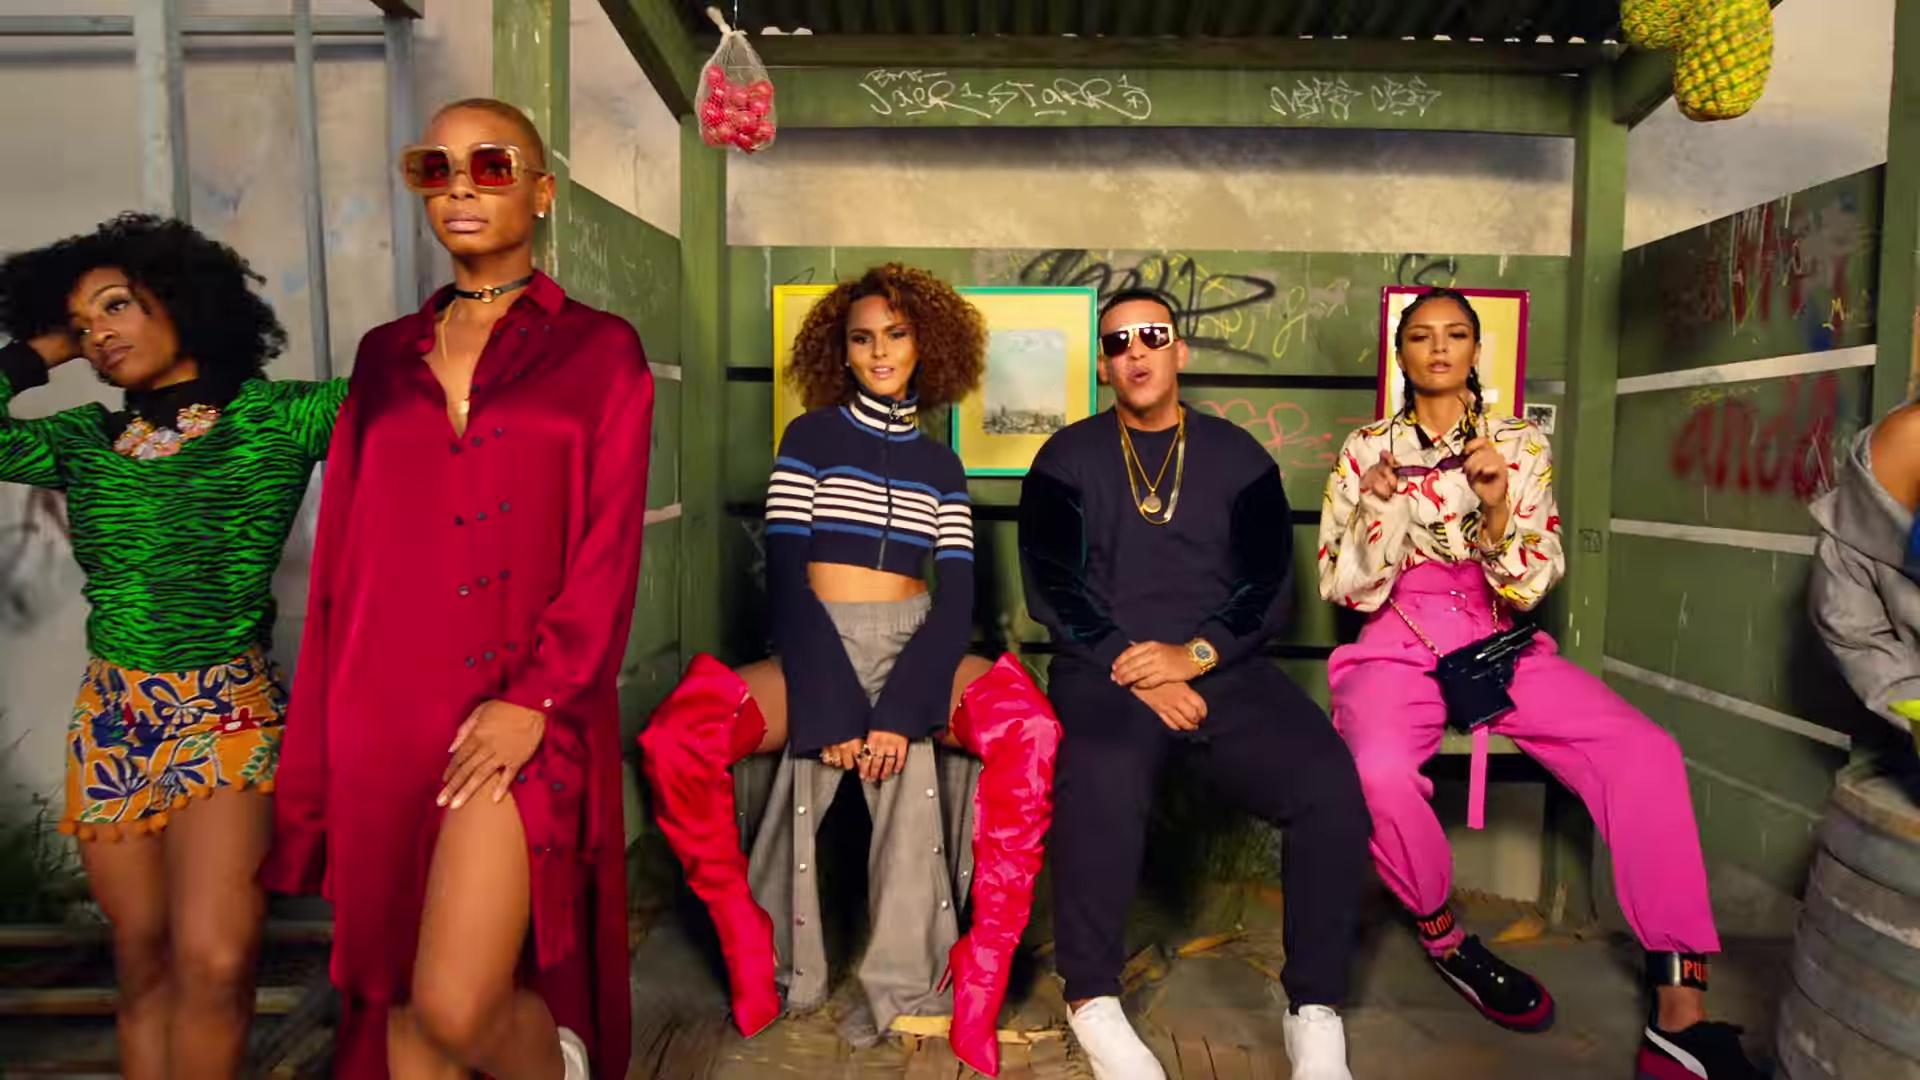 Puma Platform Shoes Worn by Model in Dura by Daddy Yankee (2018) Latin Music 7b9a6e10b